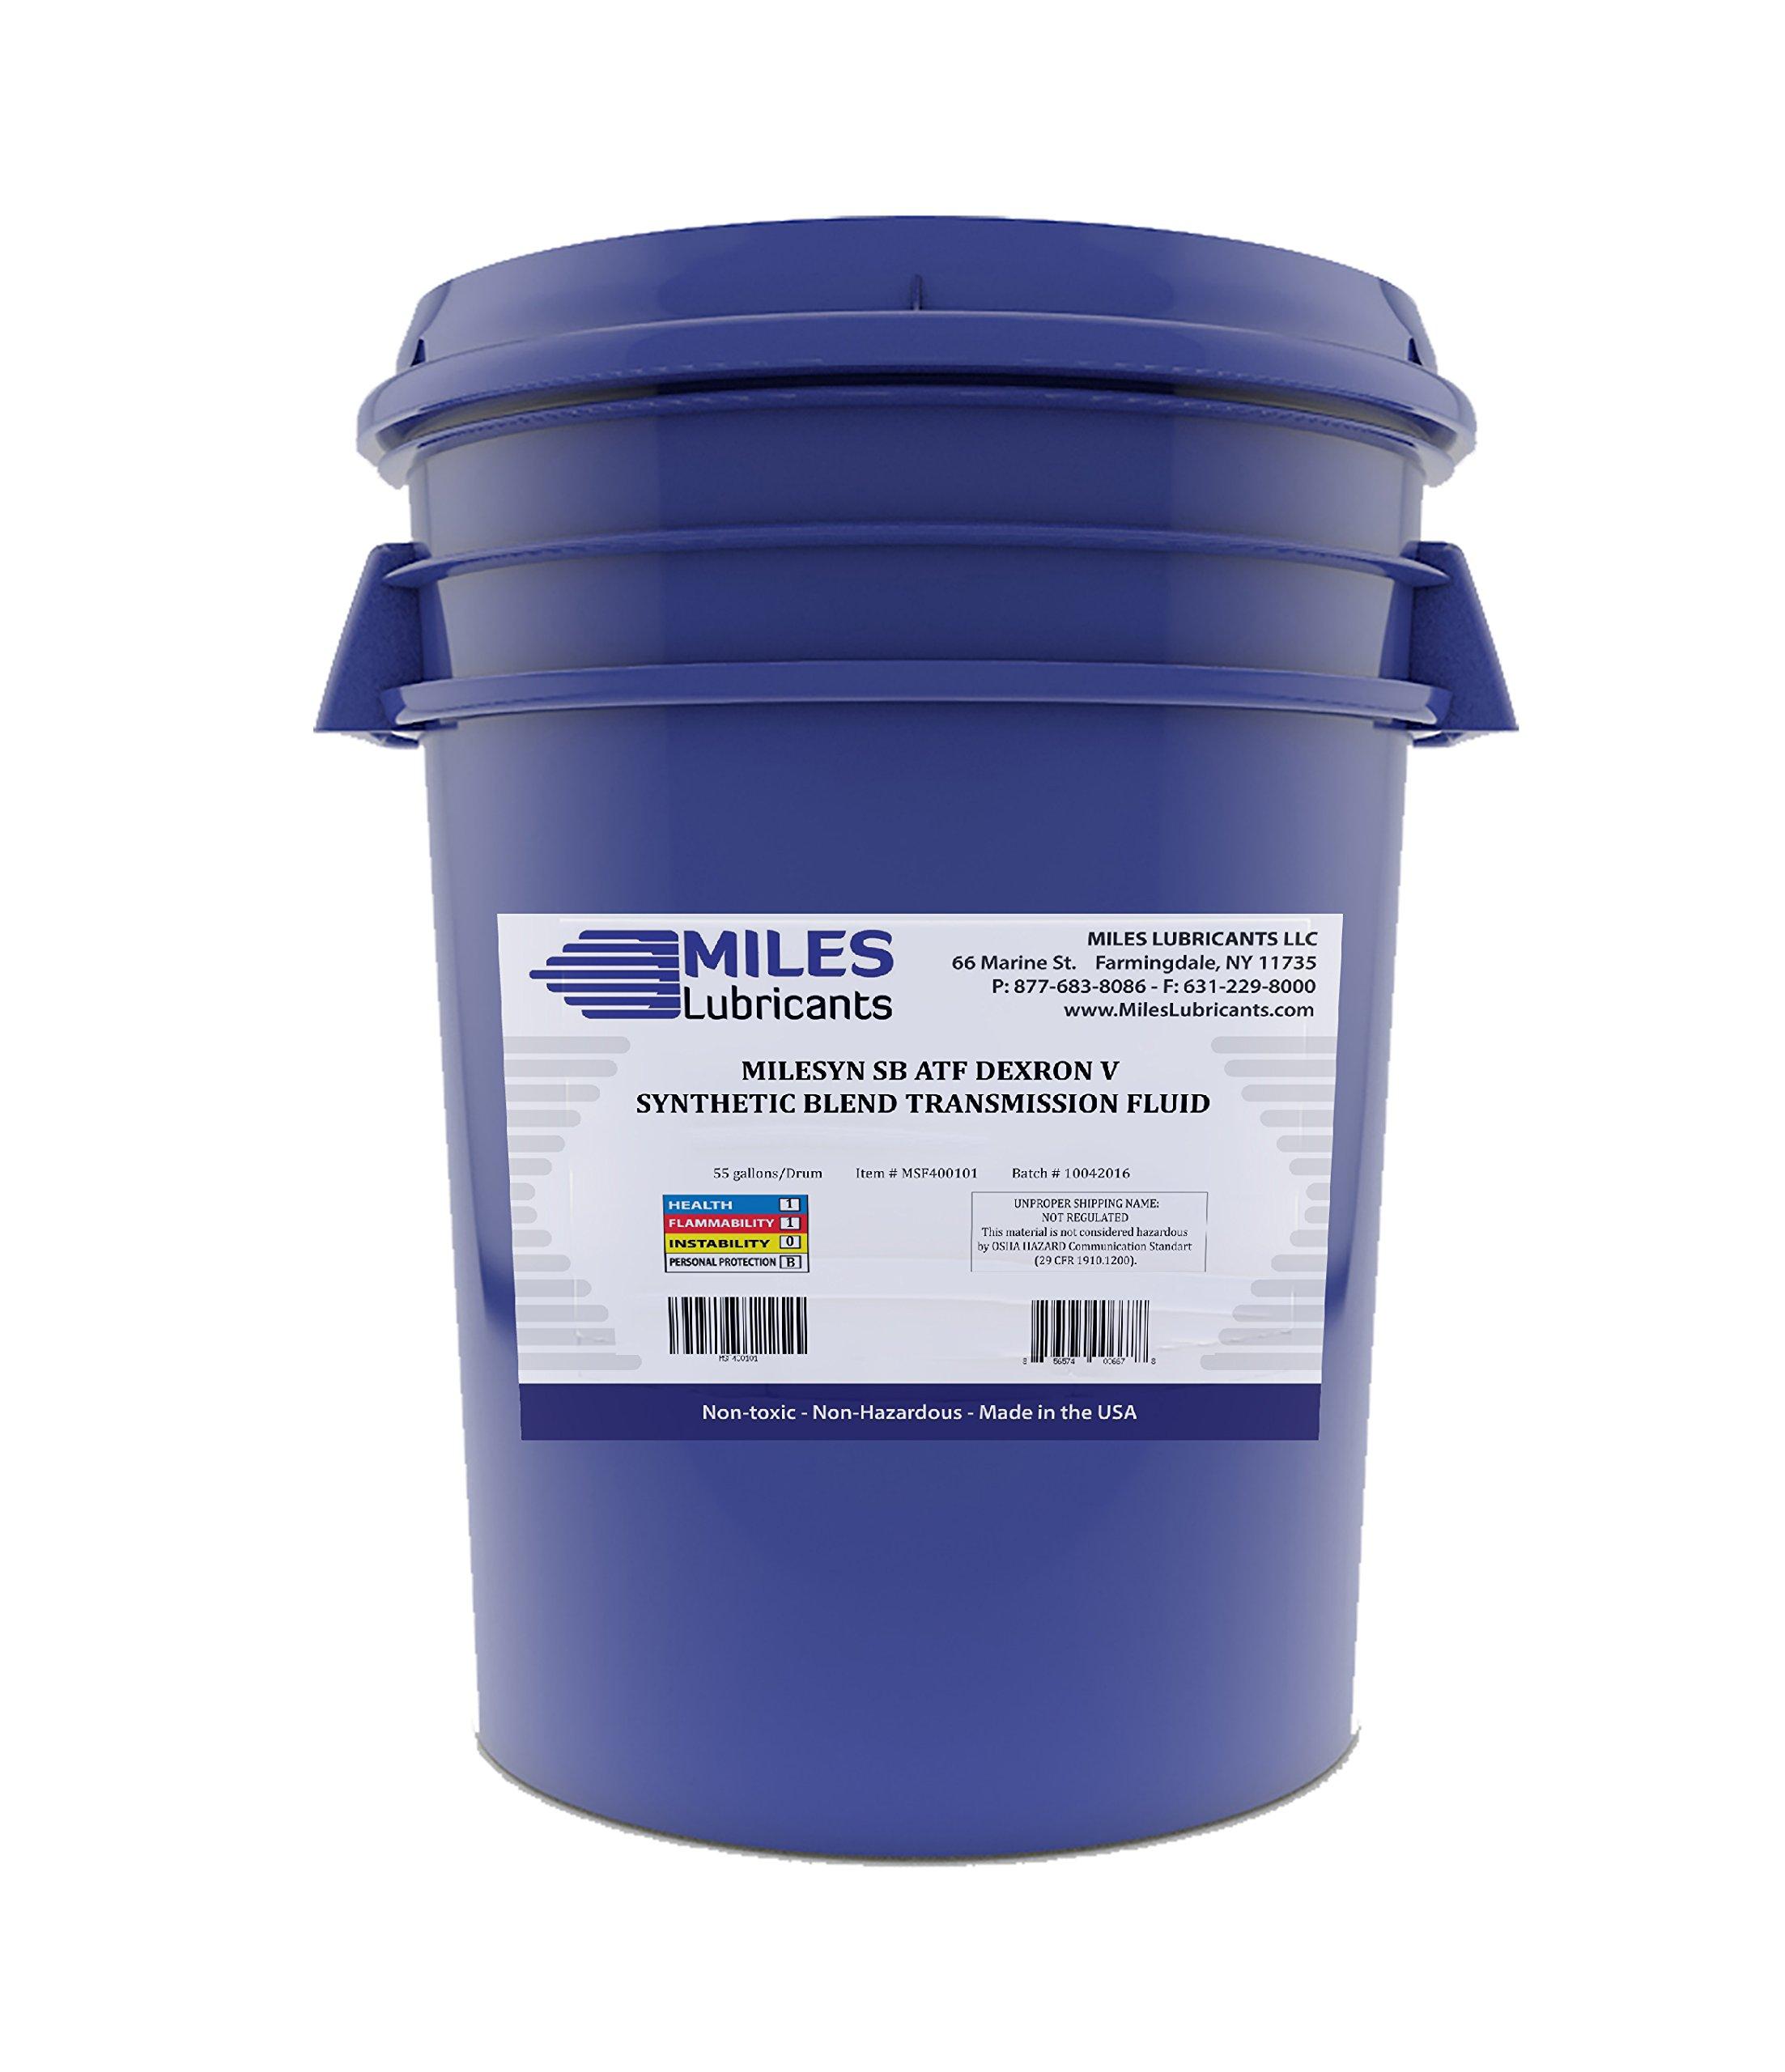 Milesyn Sb Atf Synthetic Blend Atf Trasnmission Fluid Dexron V 5 Gallon Pail